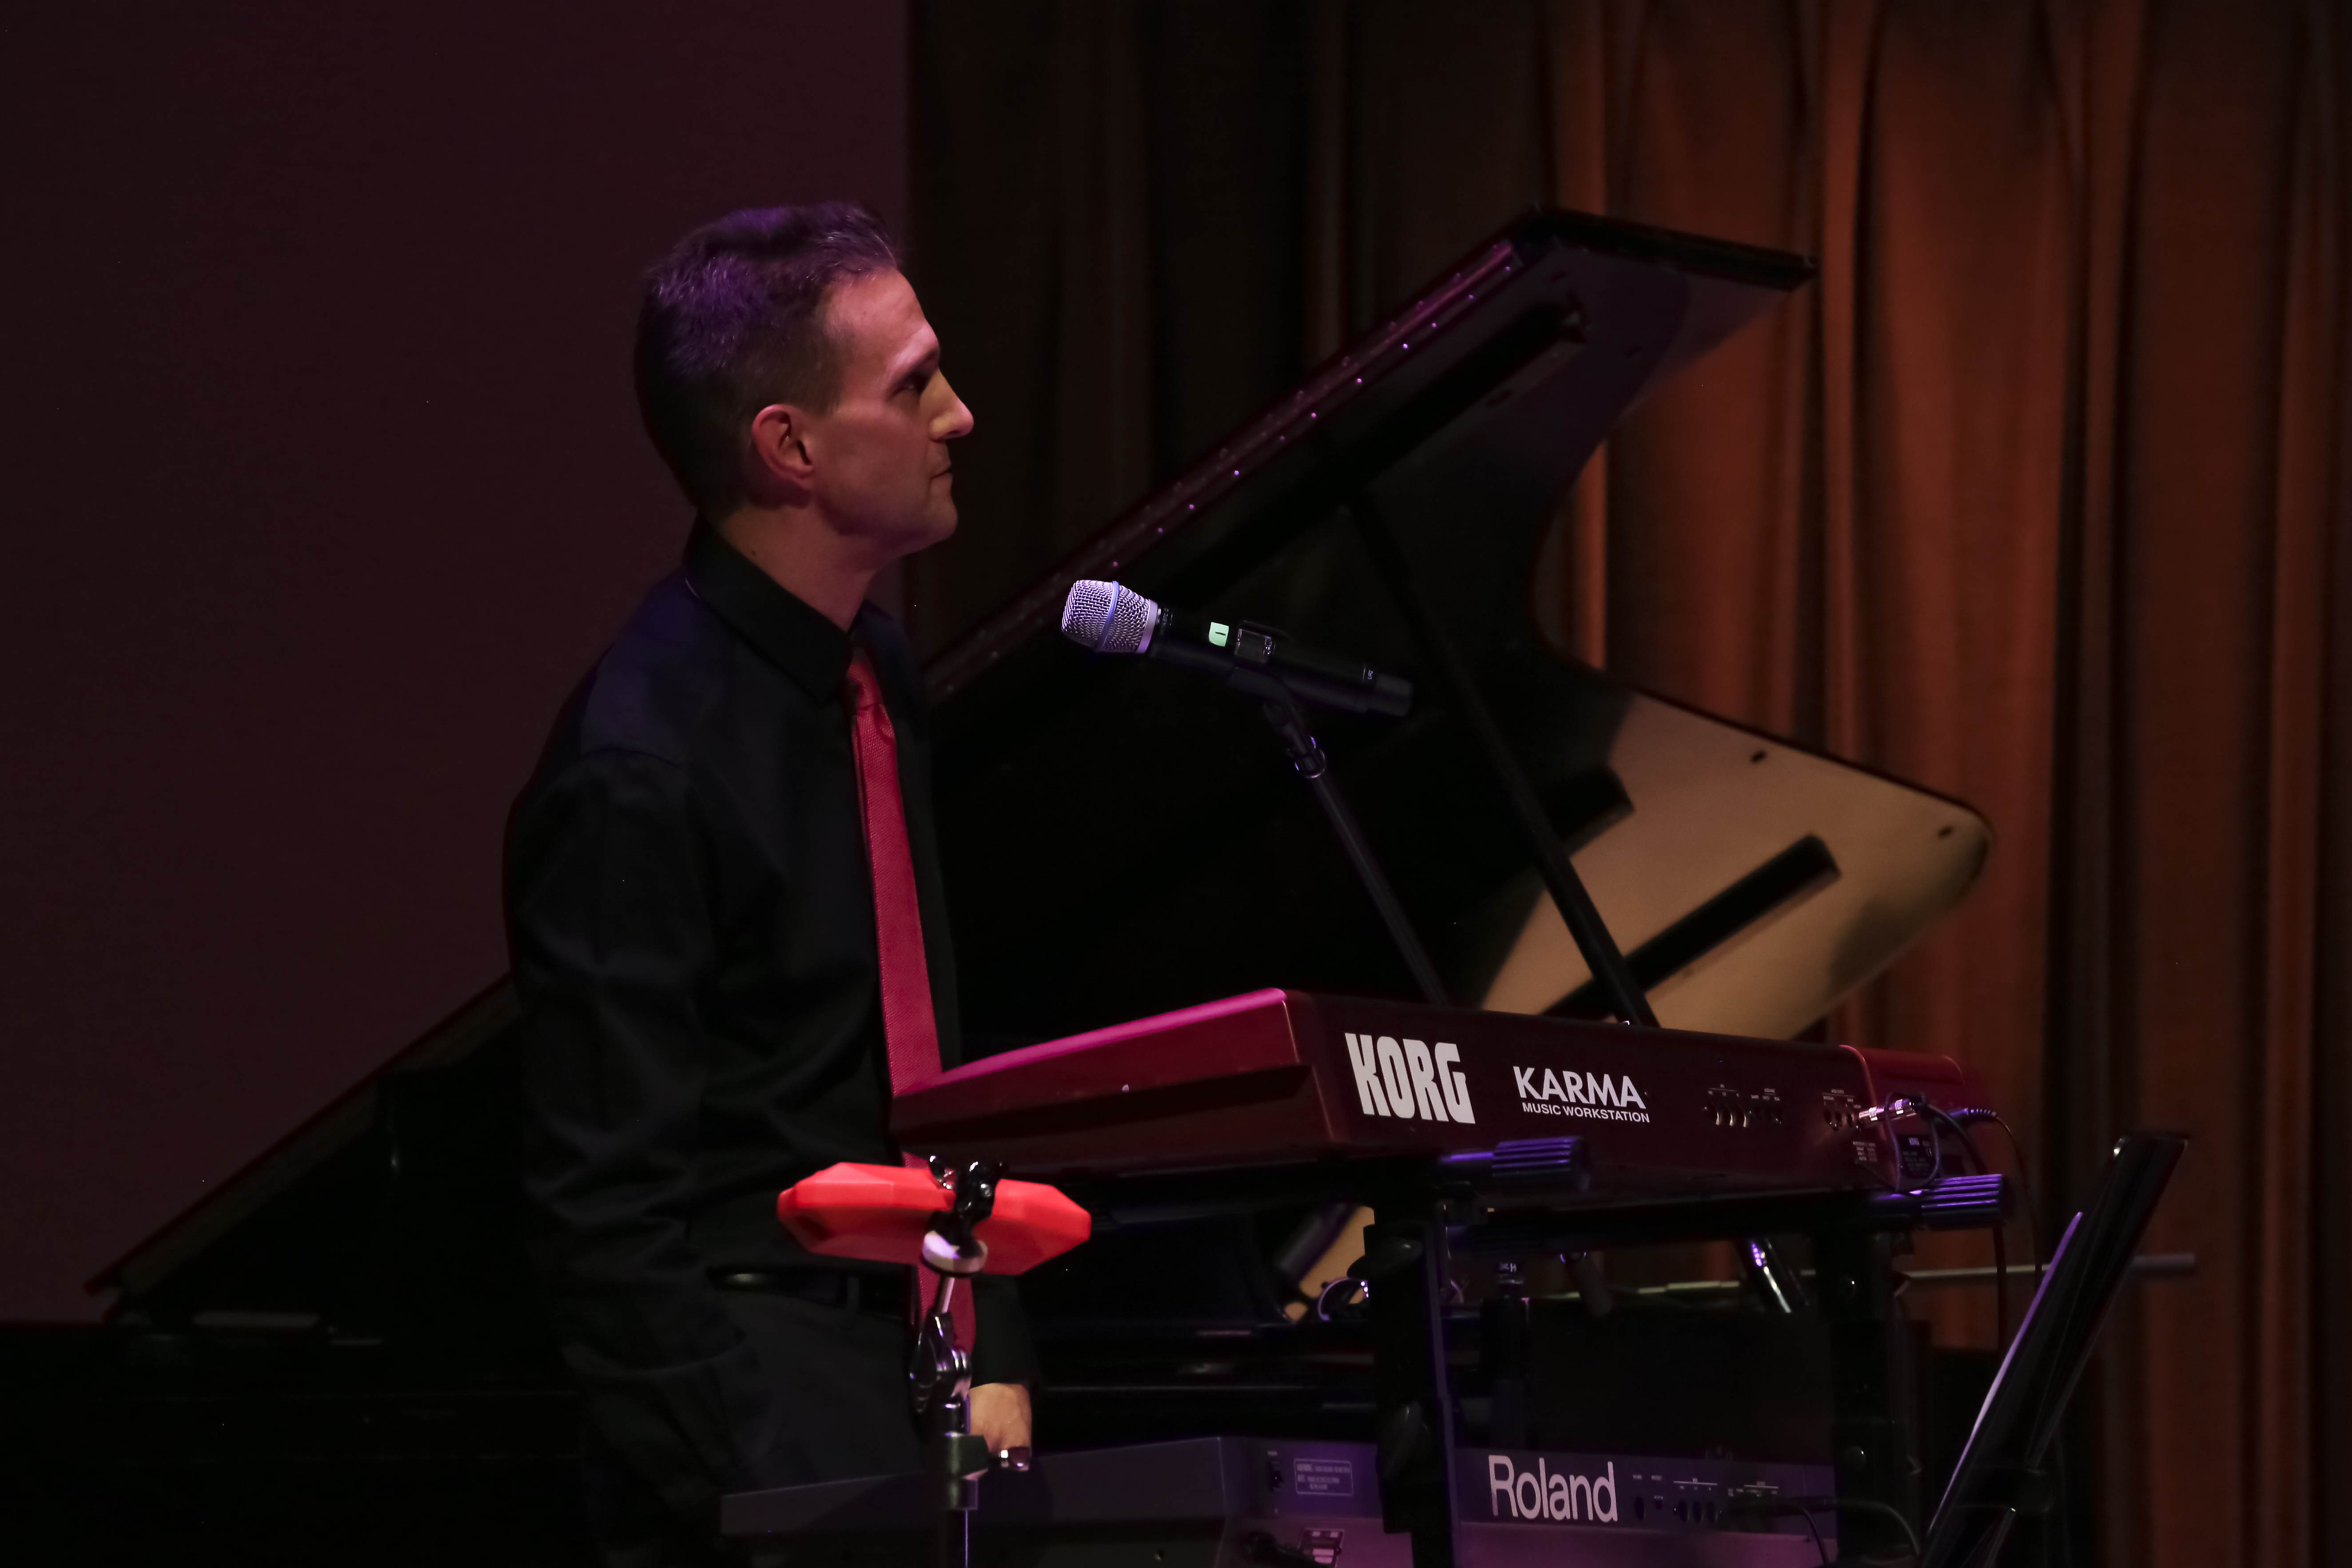 Side profile shot of John Palmer playing keyboards and